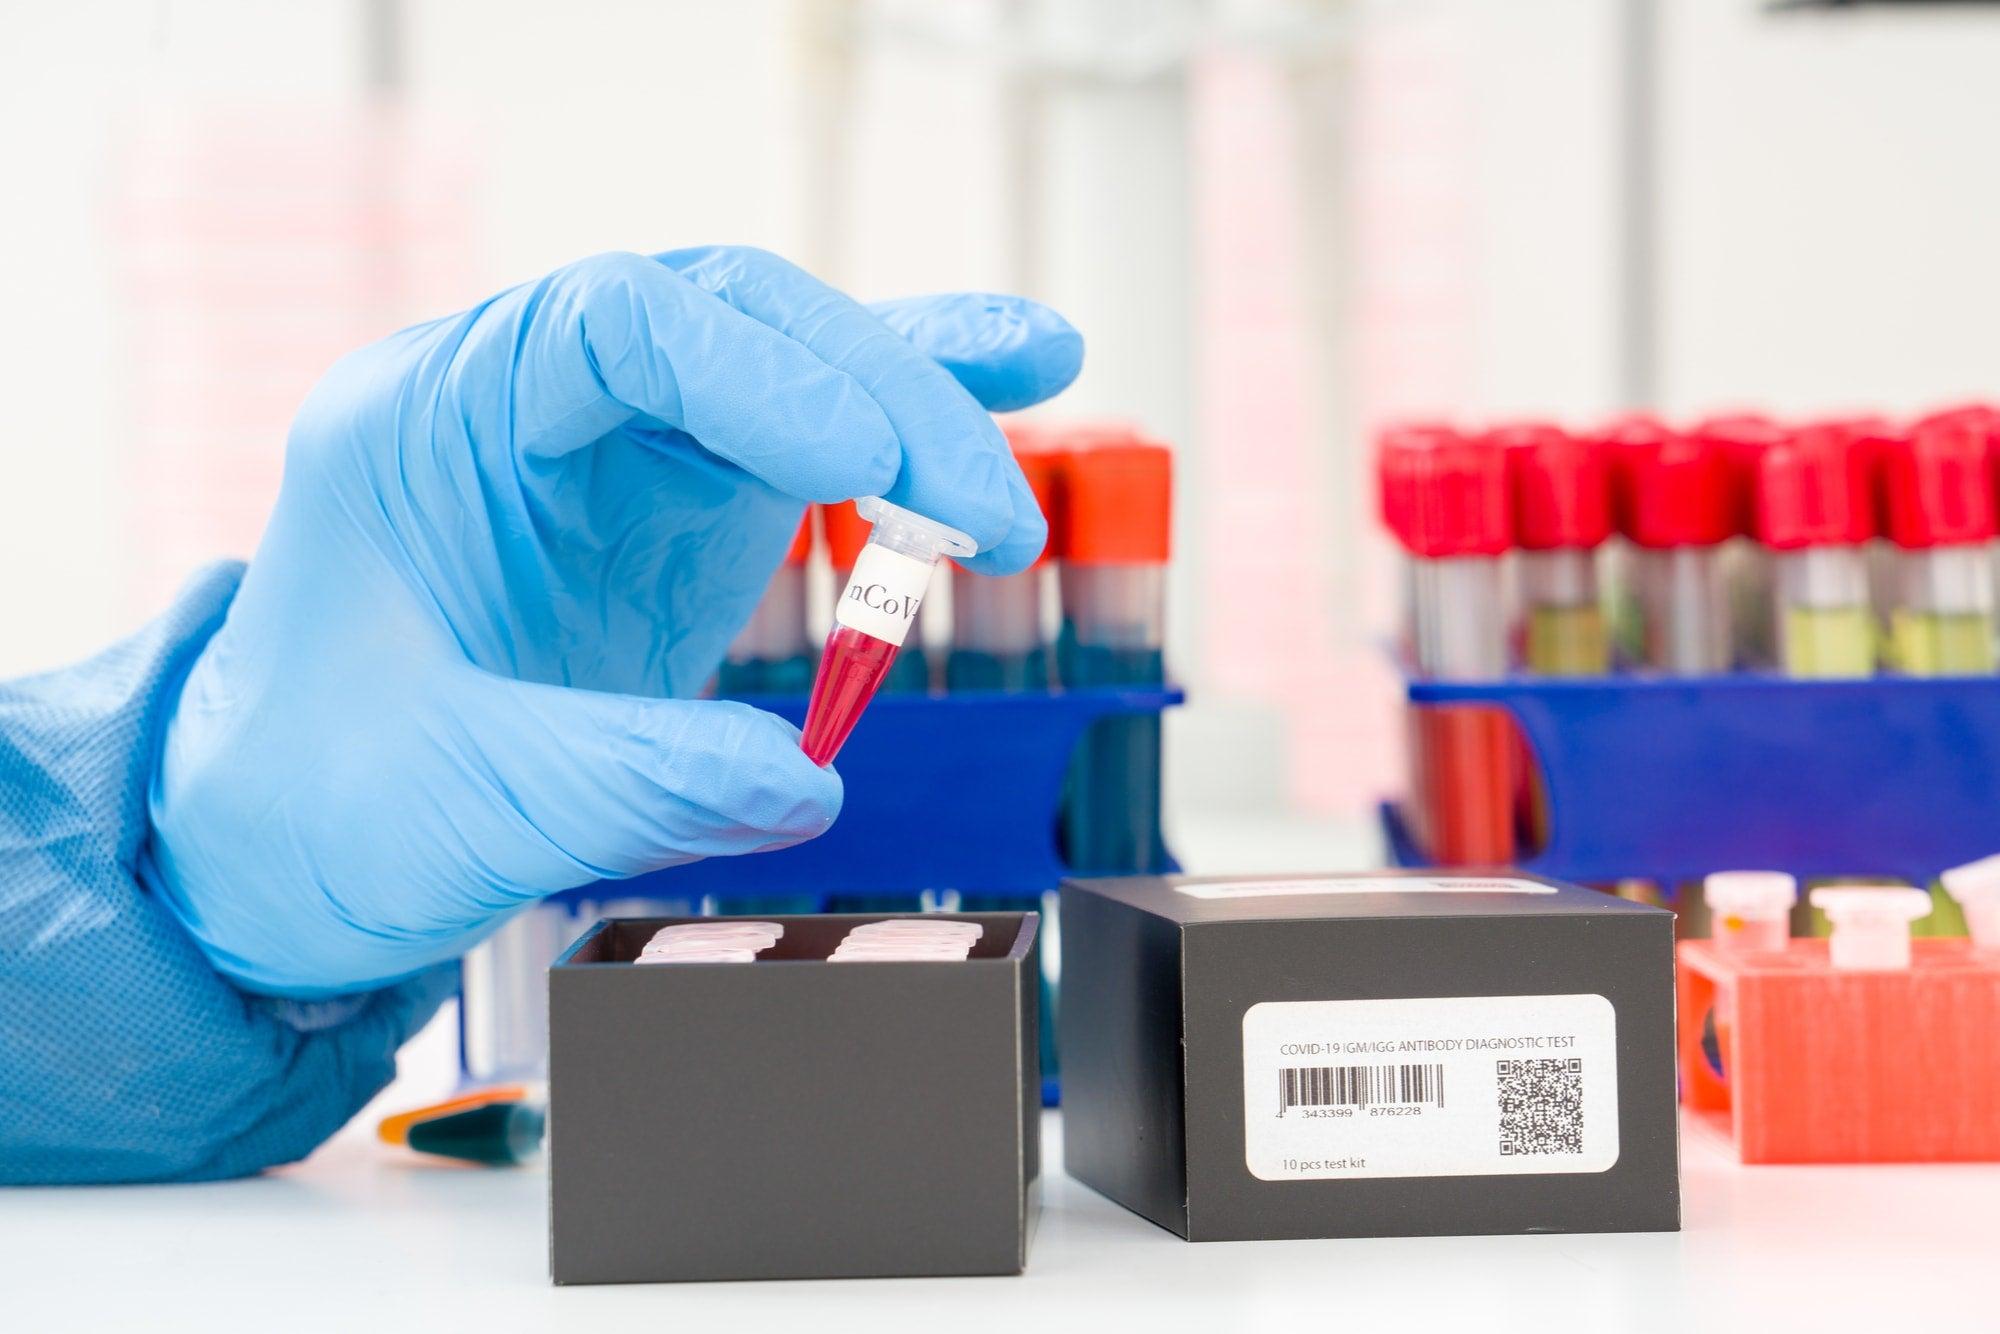 coronavirus-covid-19-pruebas-serol%C3%B3gicas-Am%C3%A9rica-Latina-Coronavirus-tests-anticuerpos-min